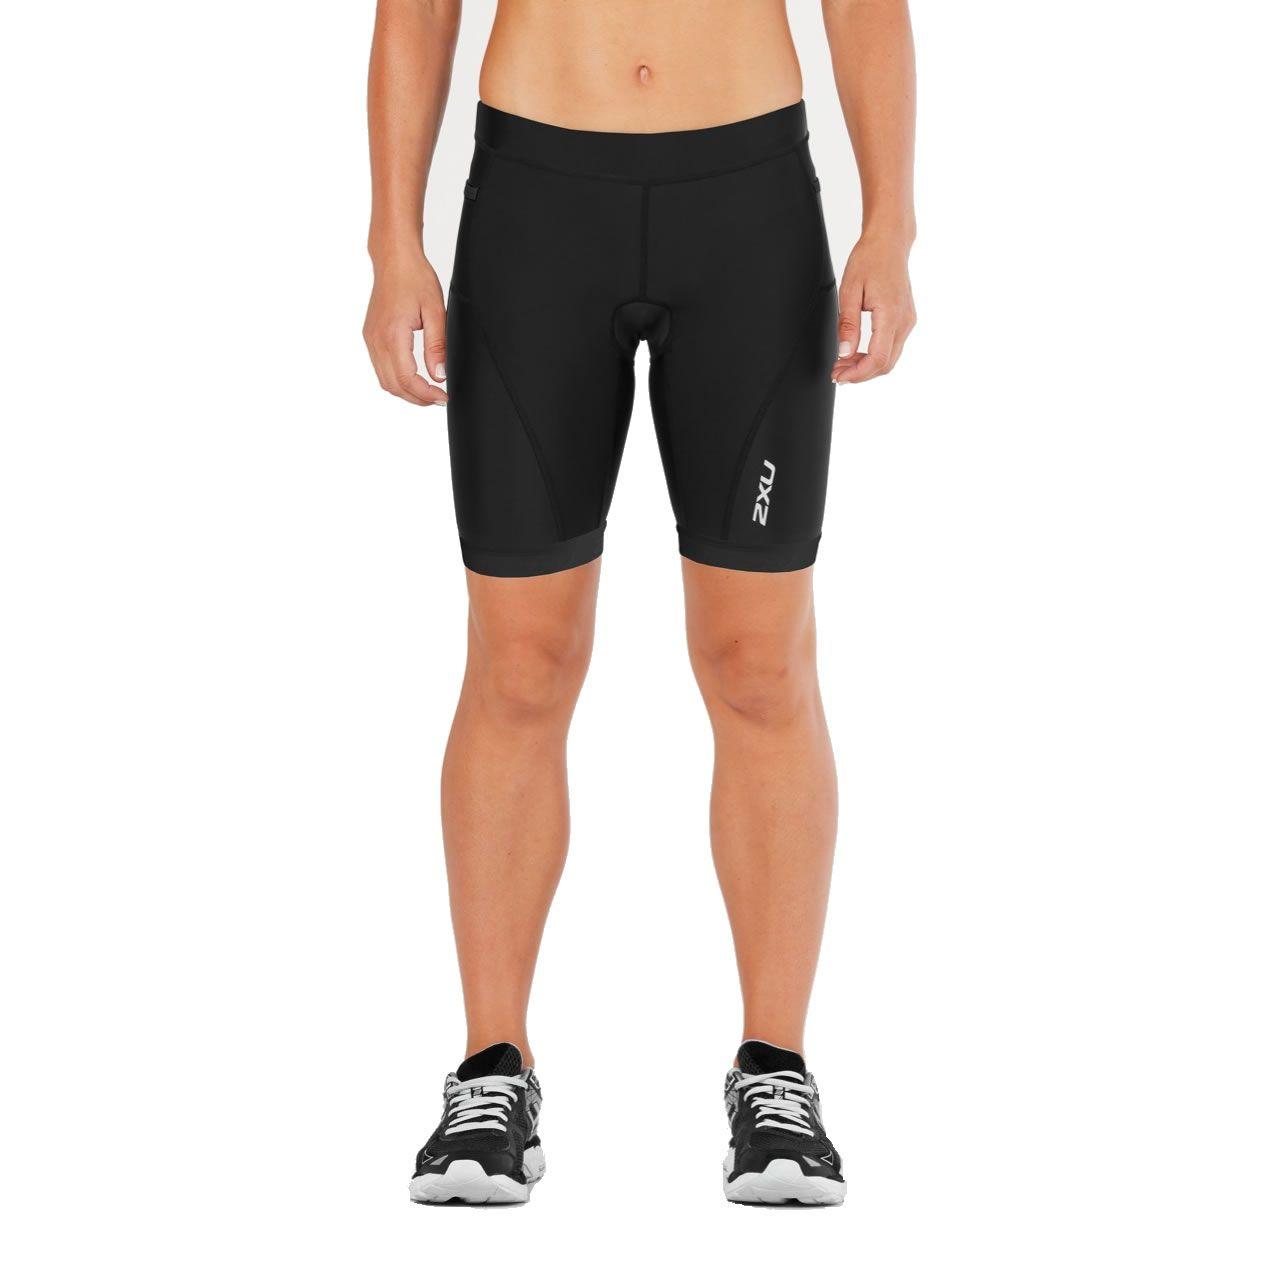 Active Triathlon Hose Damen - 2XU